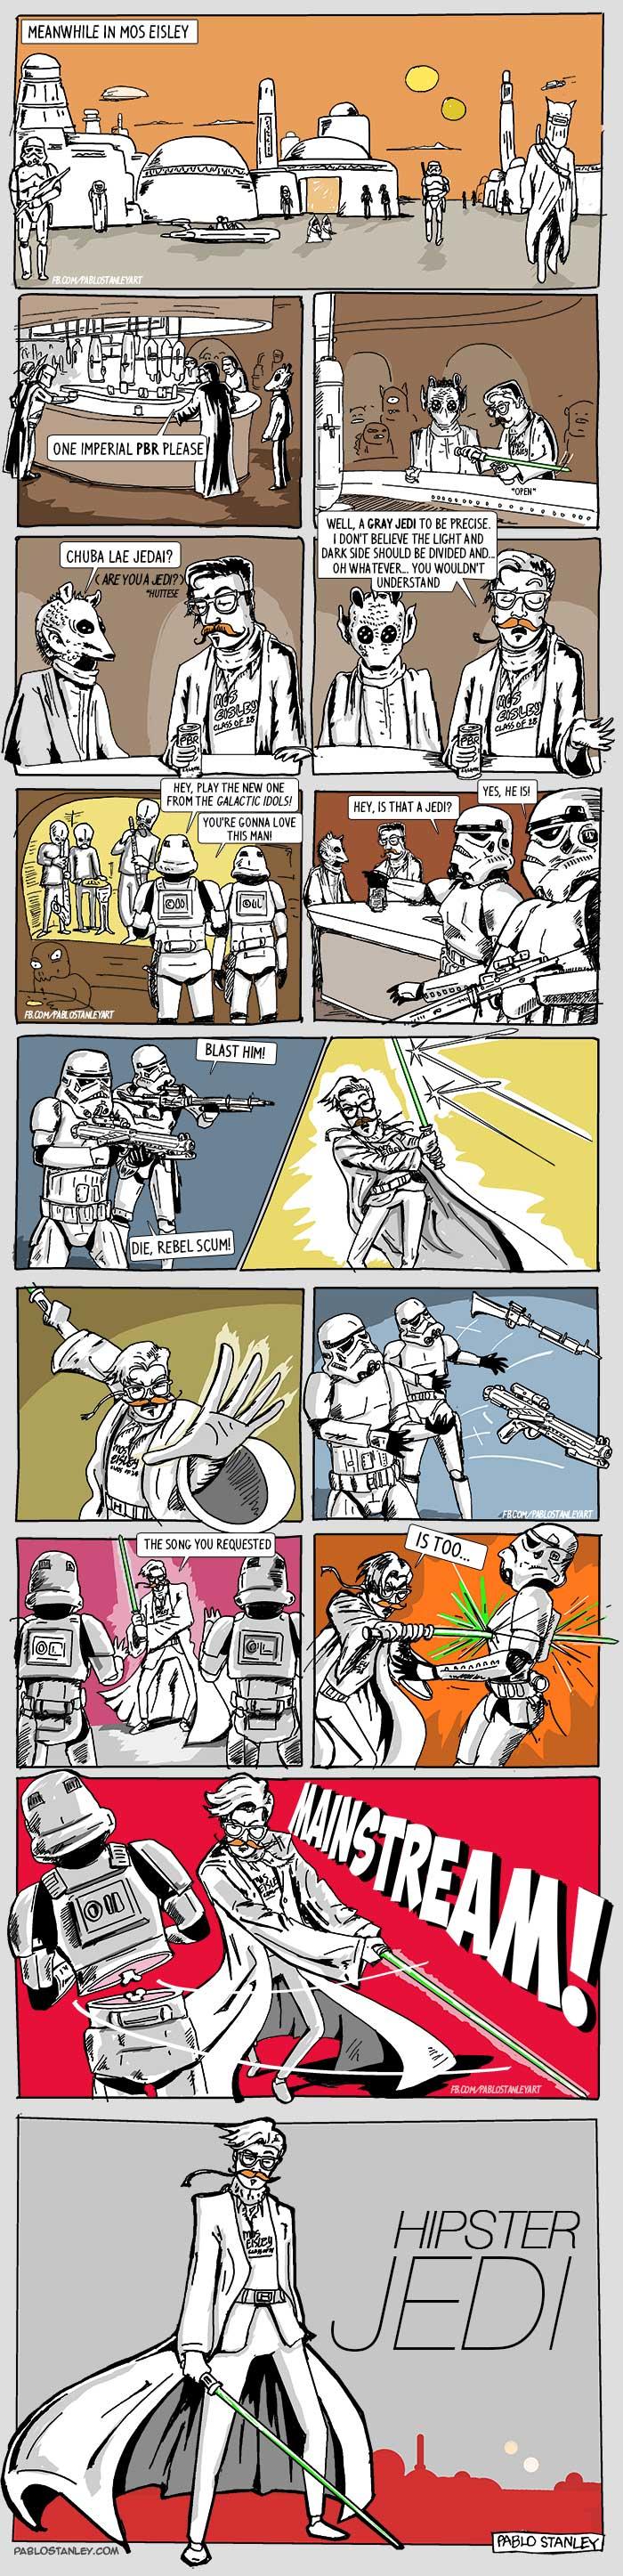 Hipster Jedi